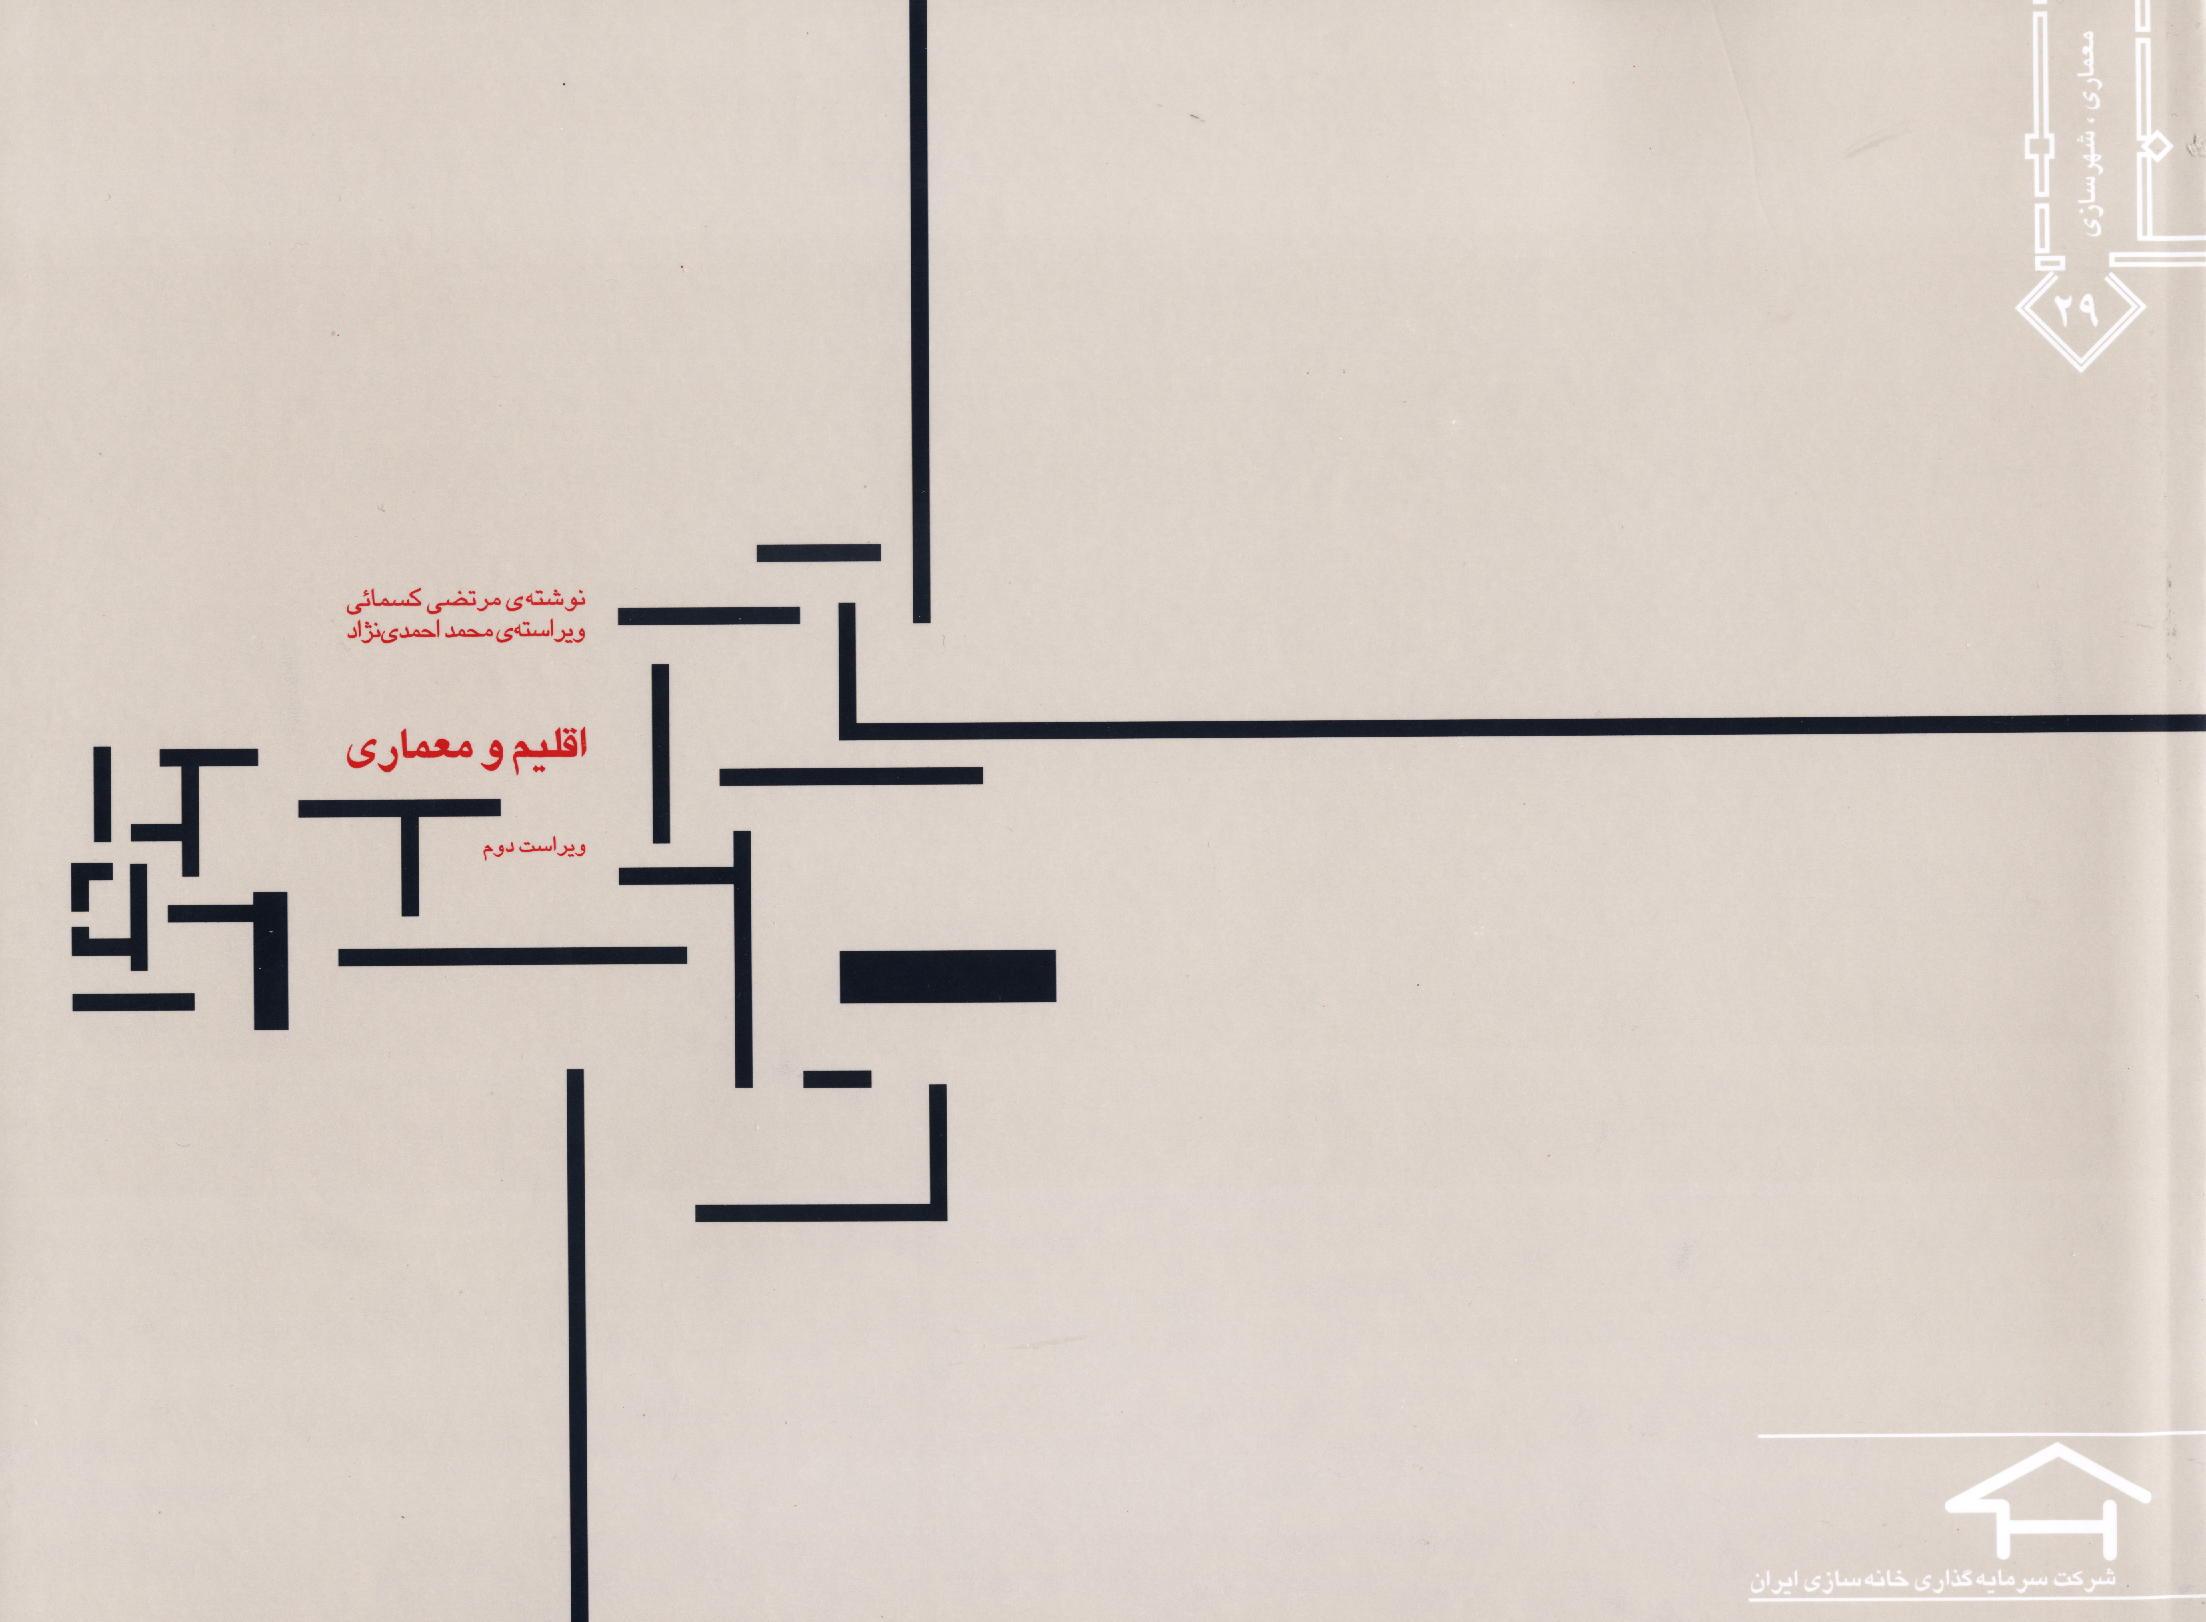 Architectural Design Books Pdf petawilsonus Inspirational Home